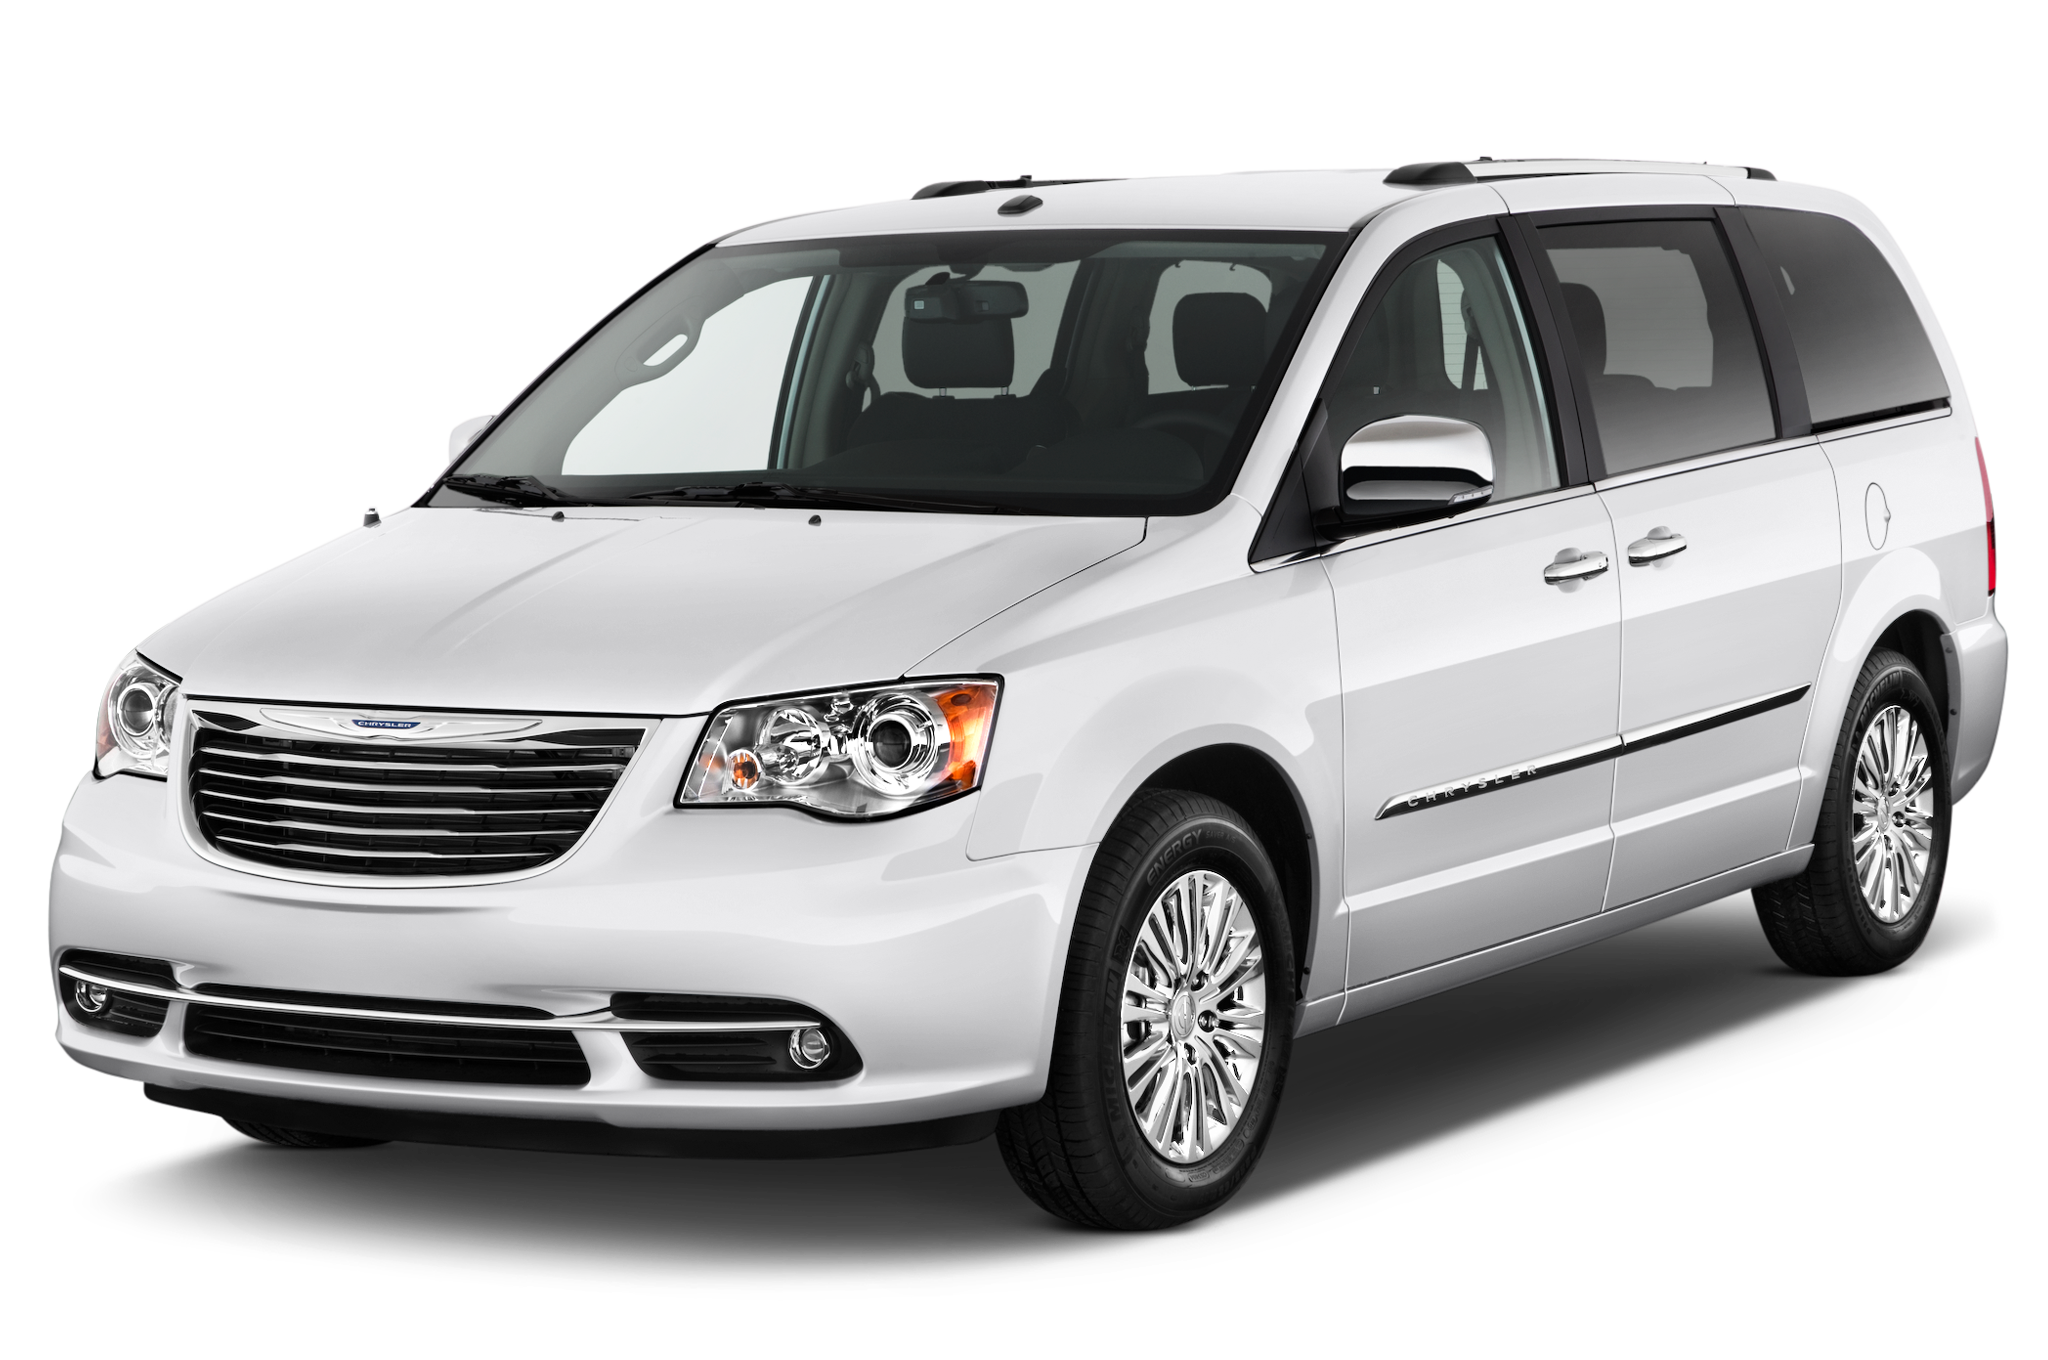 Used minivans for sale. Minivan clipart service van